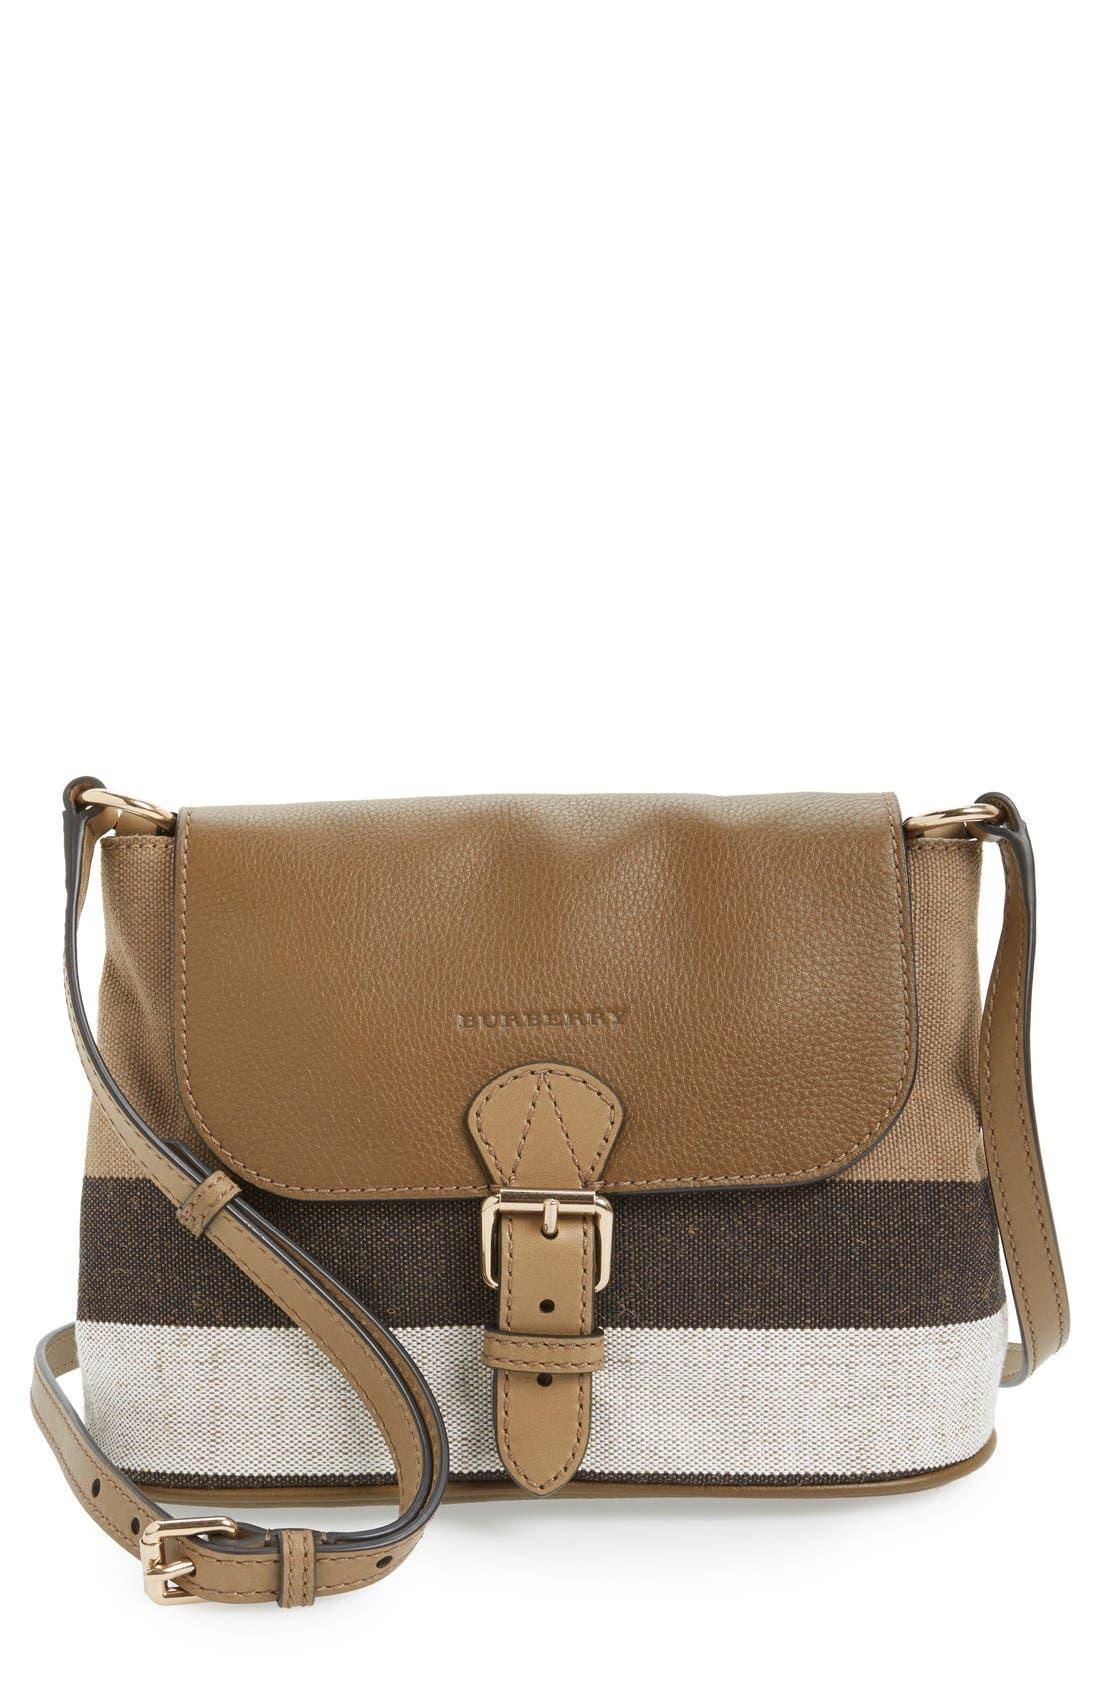 Main Image - Burberry 'Small Gowan' Crossbody Bag